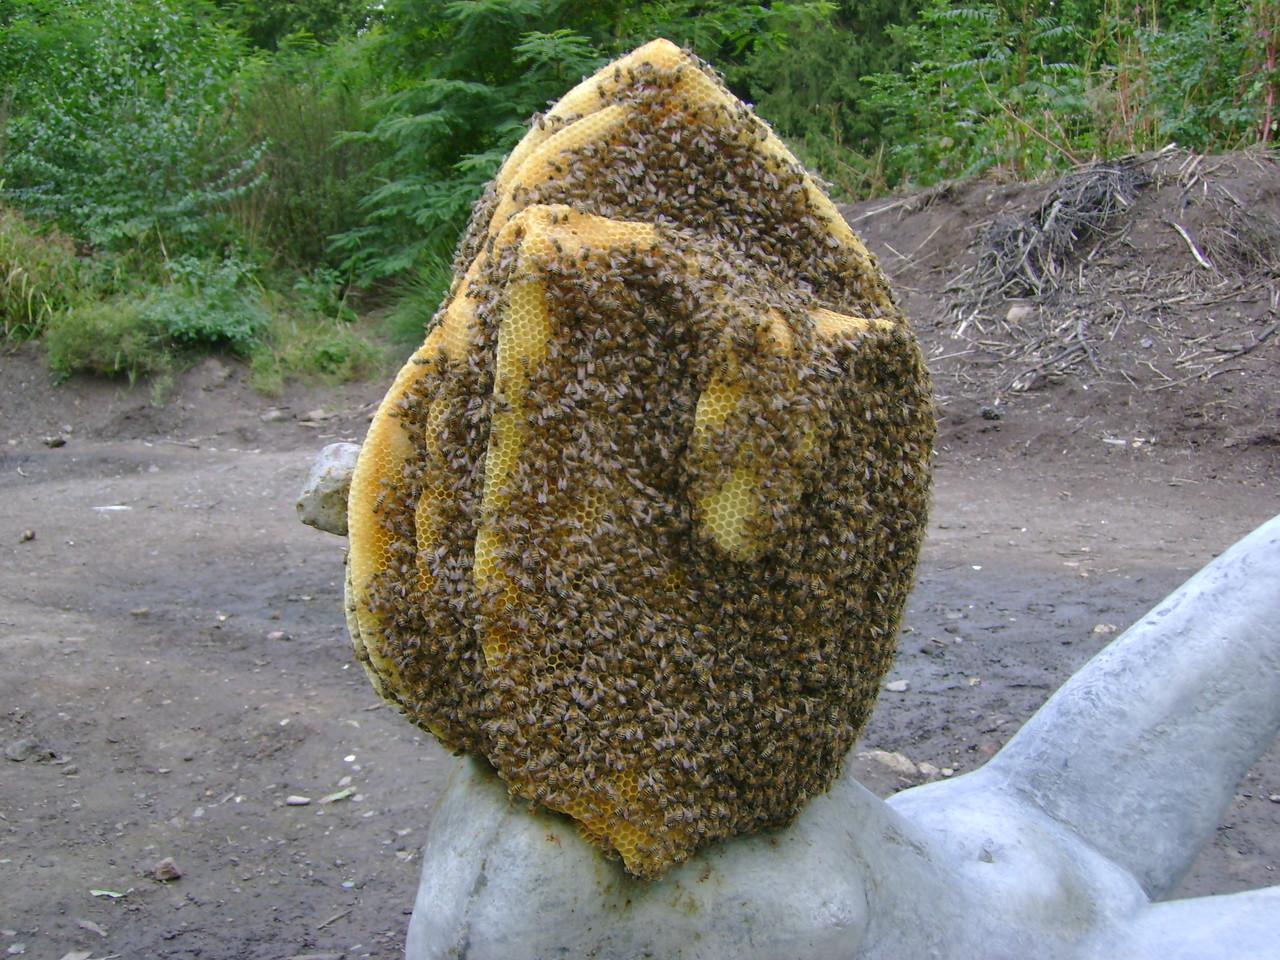 ...vor dem abfegen der Bienen